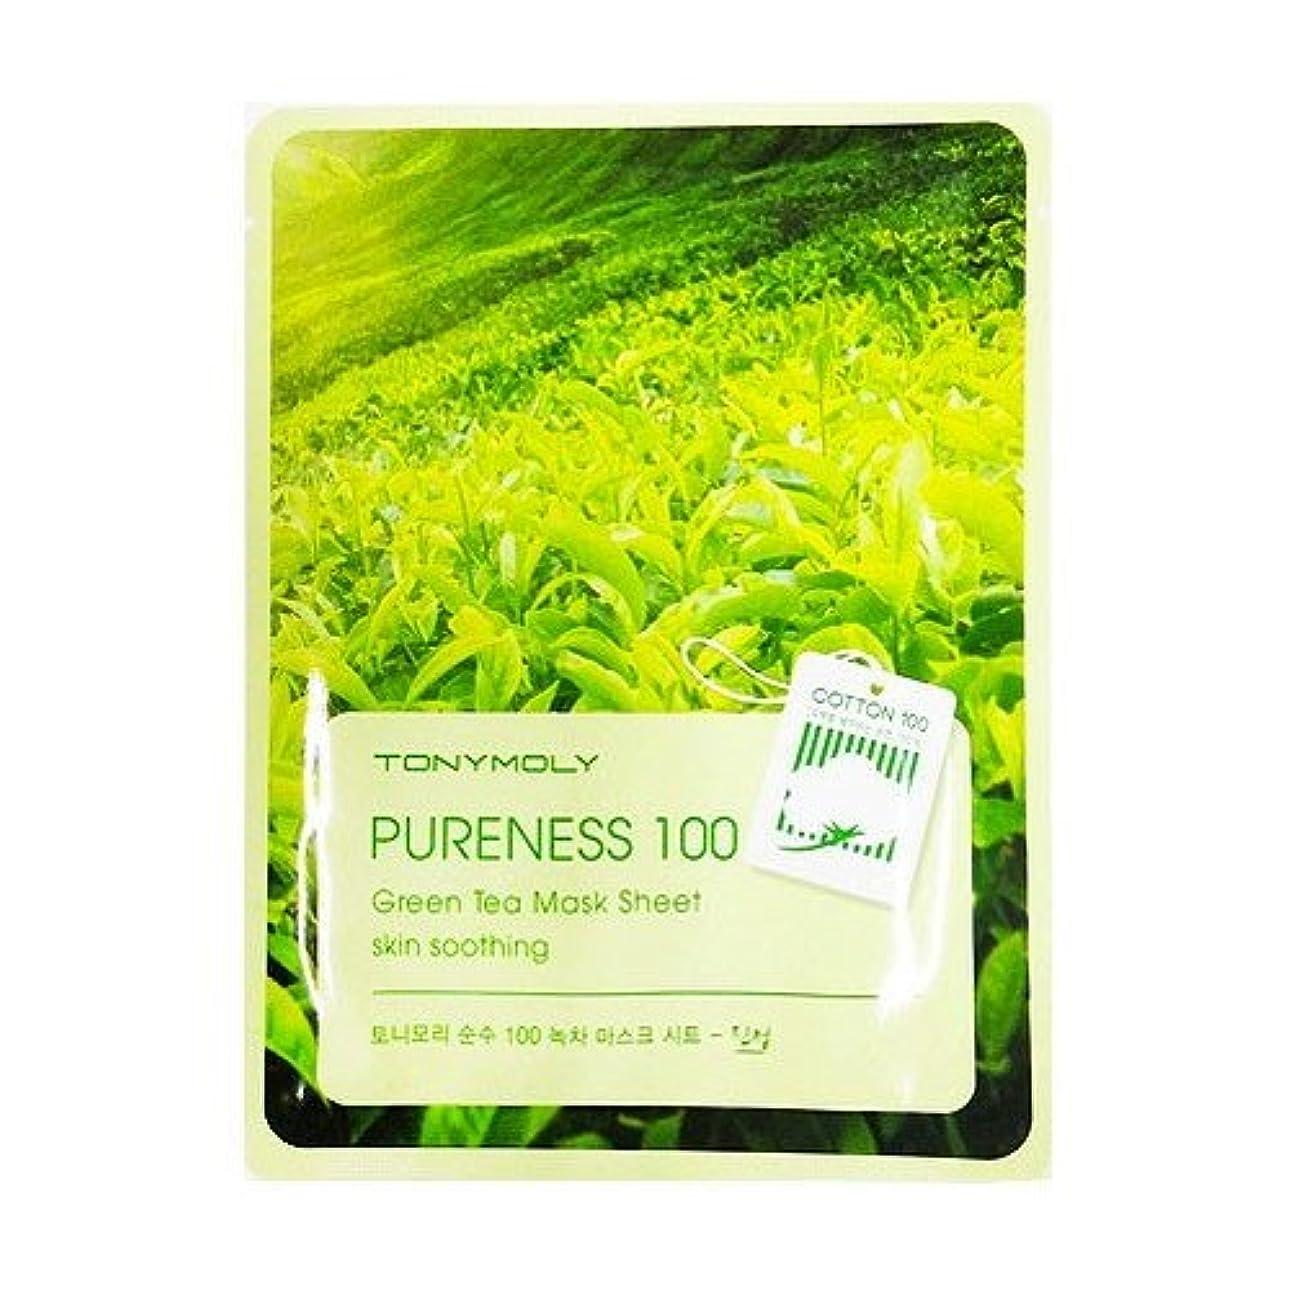 (6 Pack) TONYMOLY Pureness 100 Green Tea Mask Sheet Skin Soothing (並行輸入品)